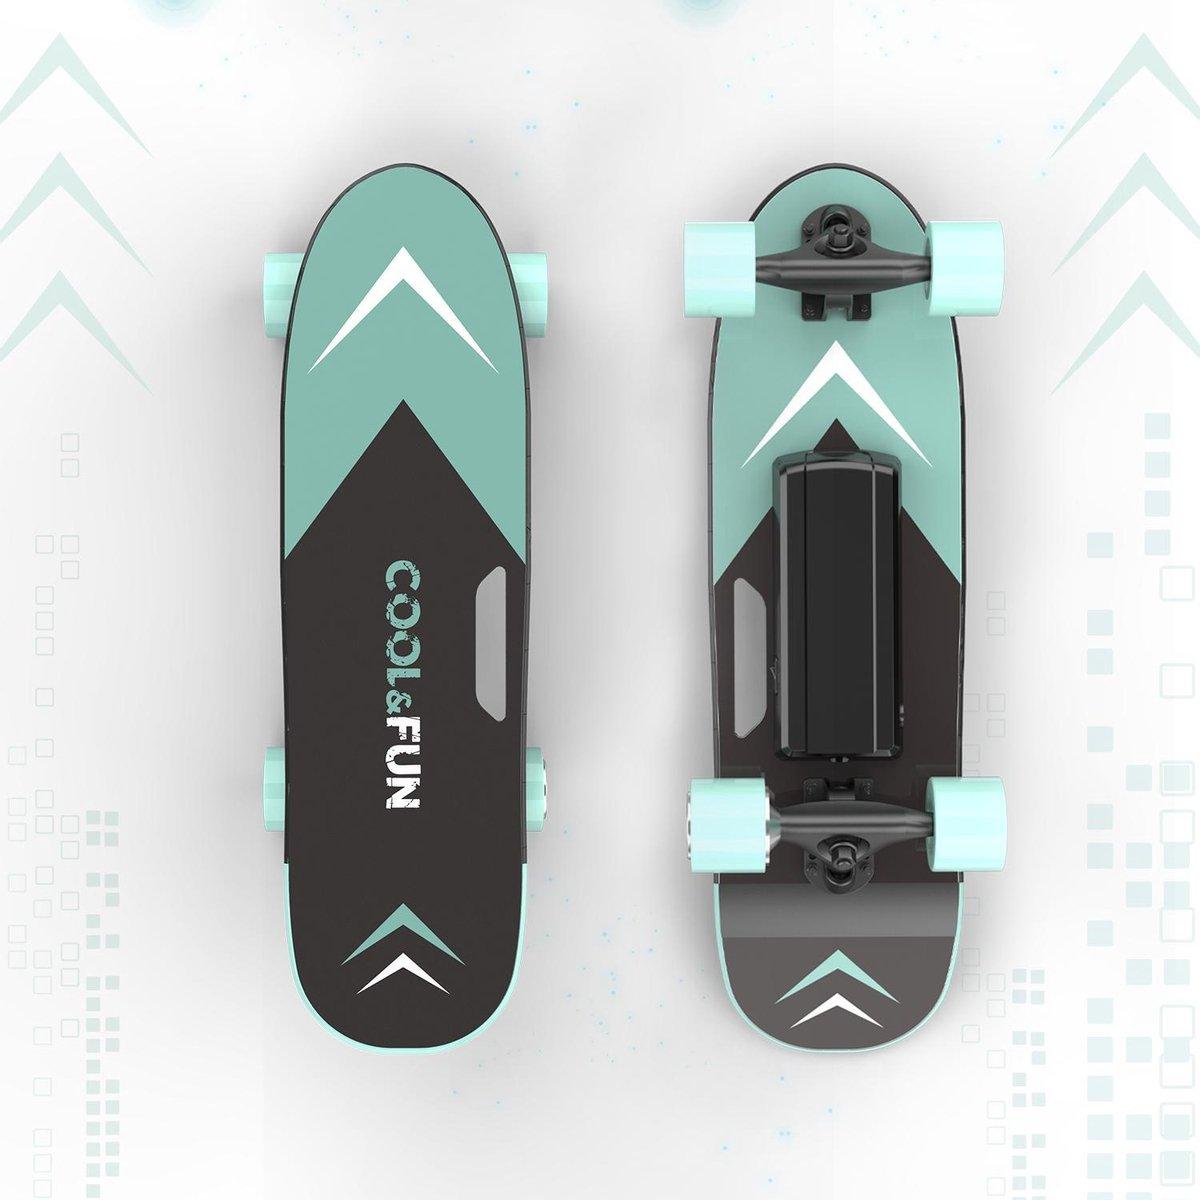 Cool & Fun Elektrisch Skateboard Mini Longboard   Met Afstandsbediening   Groen